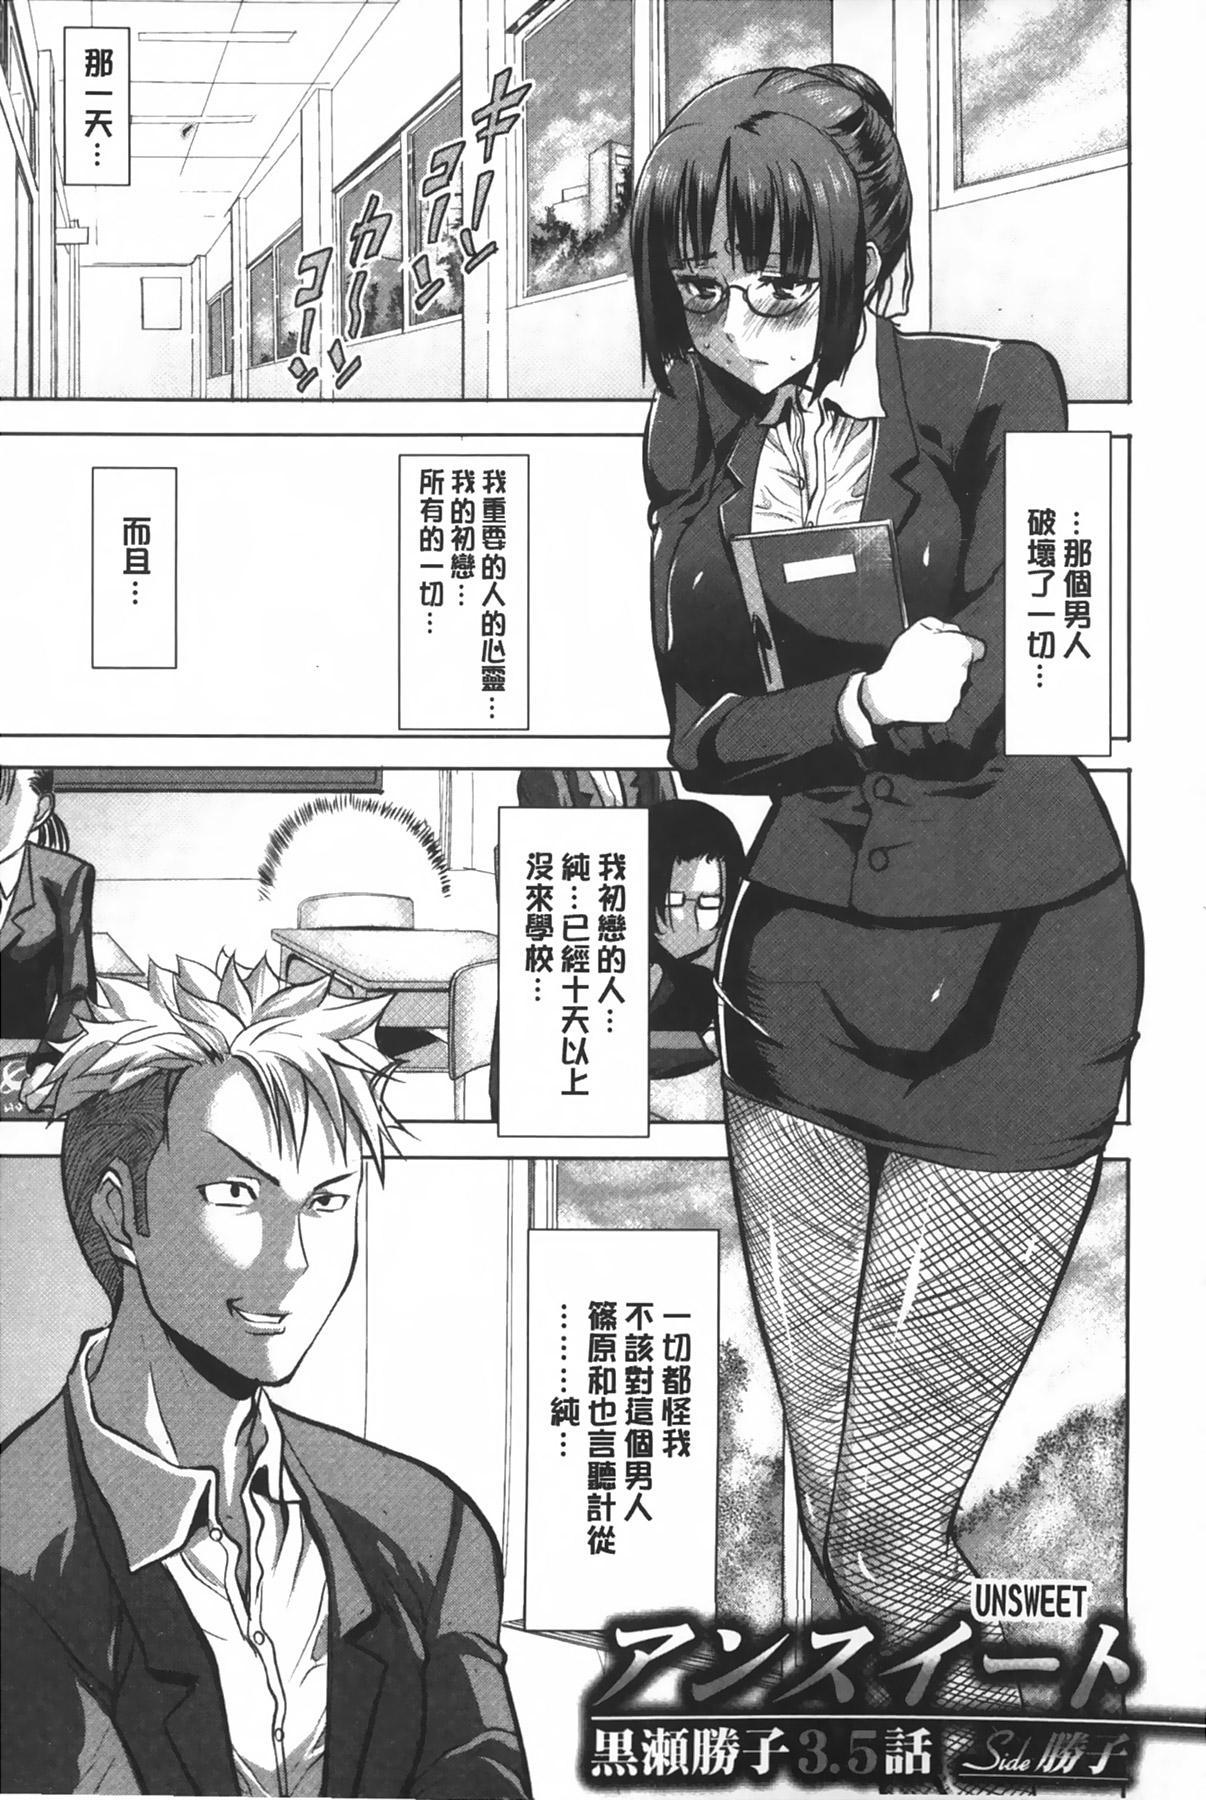 Ane Unsweet - Mihiragi Hiyori + | 姊姊不甜美 彌平木日和+ 139